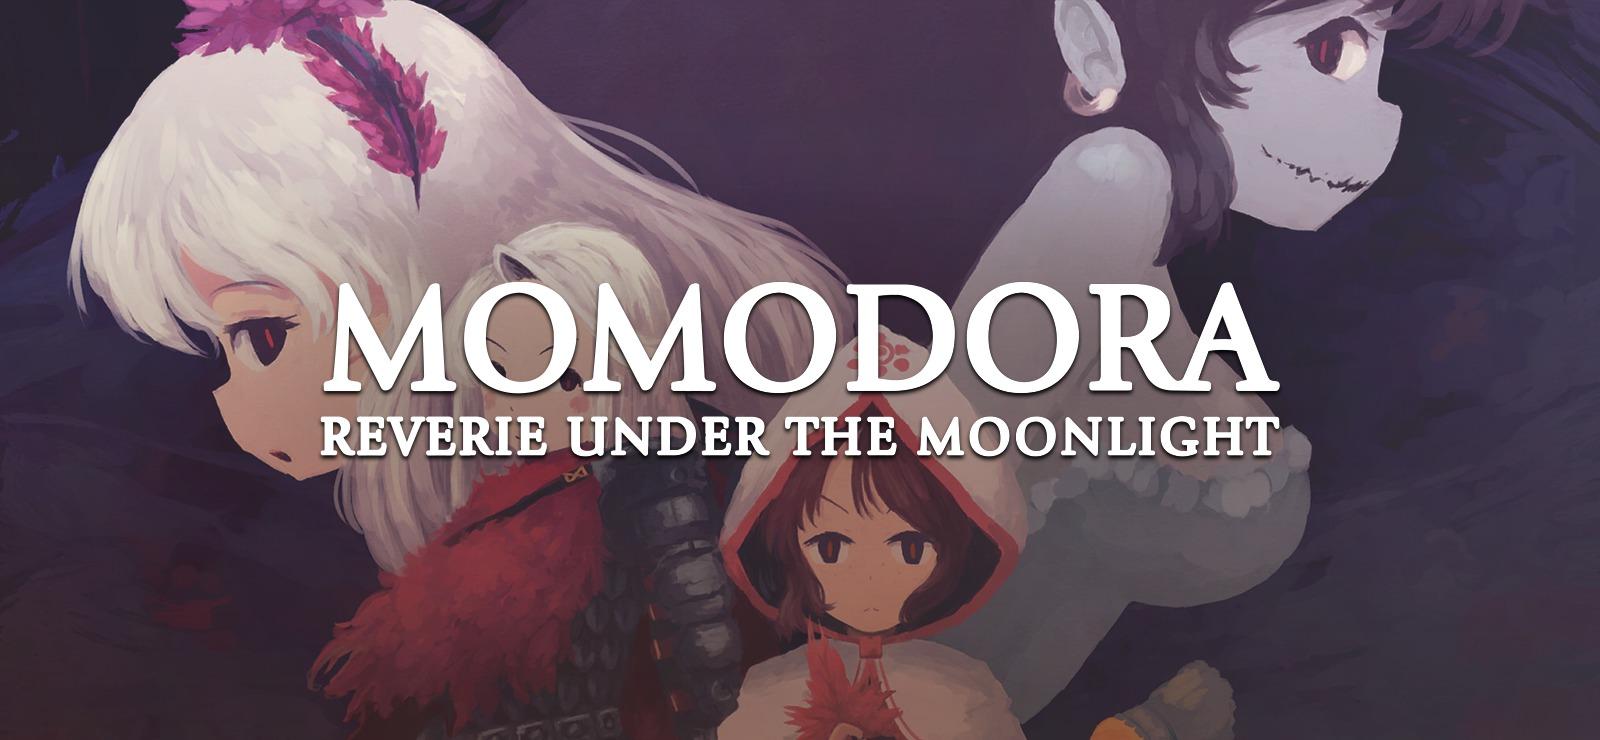 momodora-rutm_1.jpg